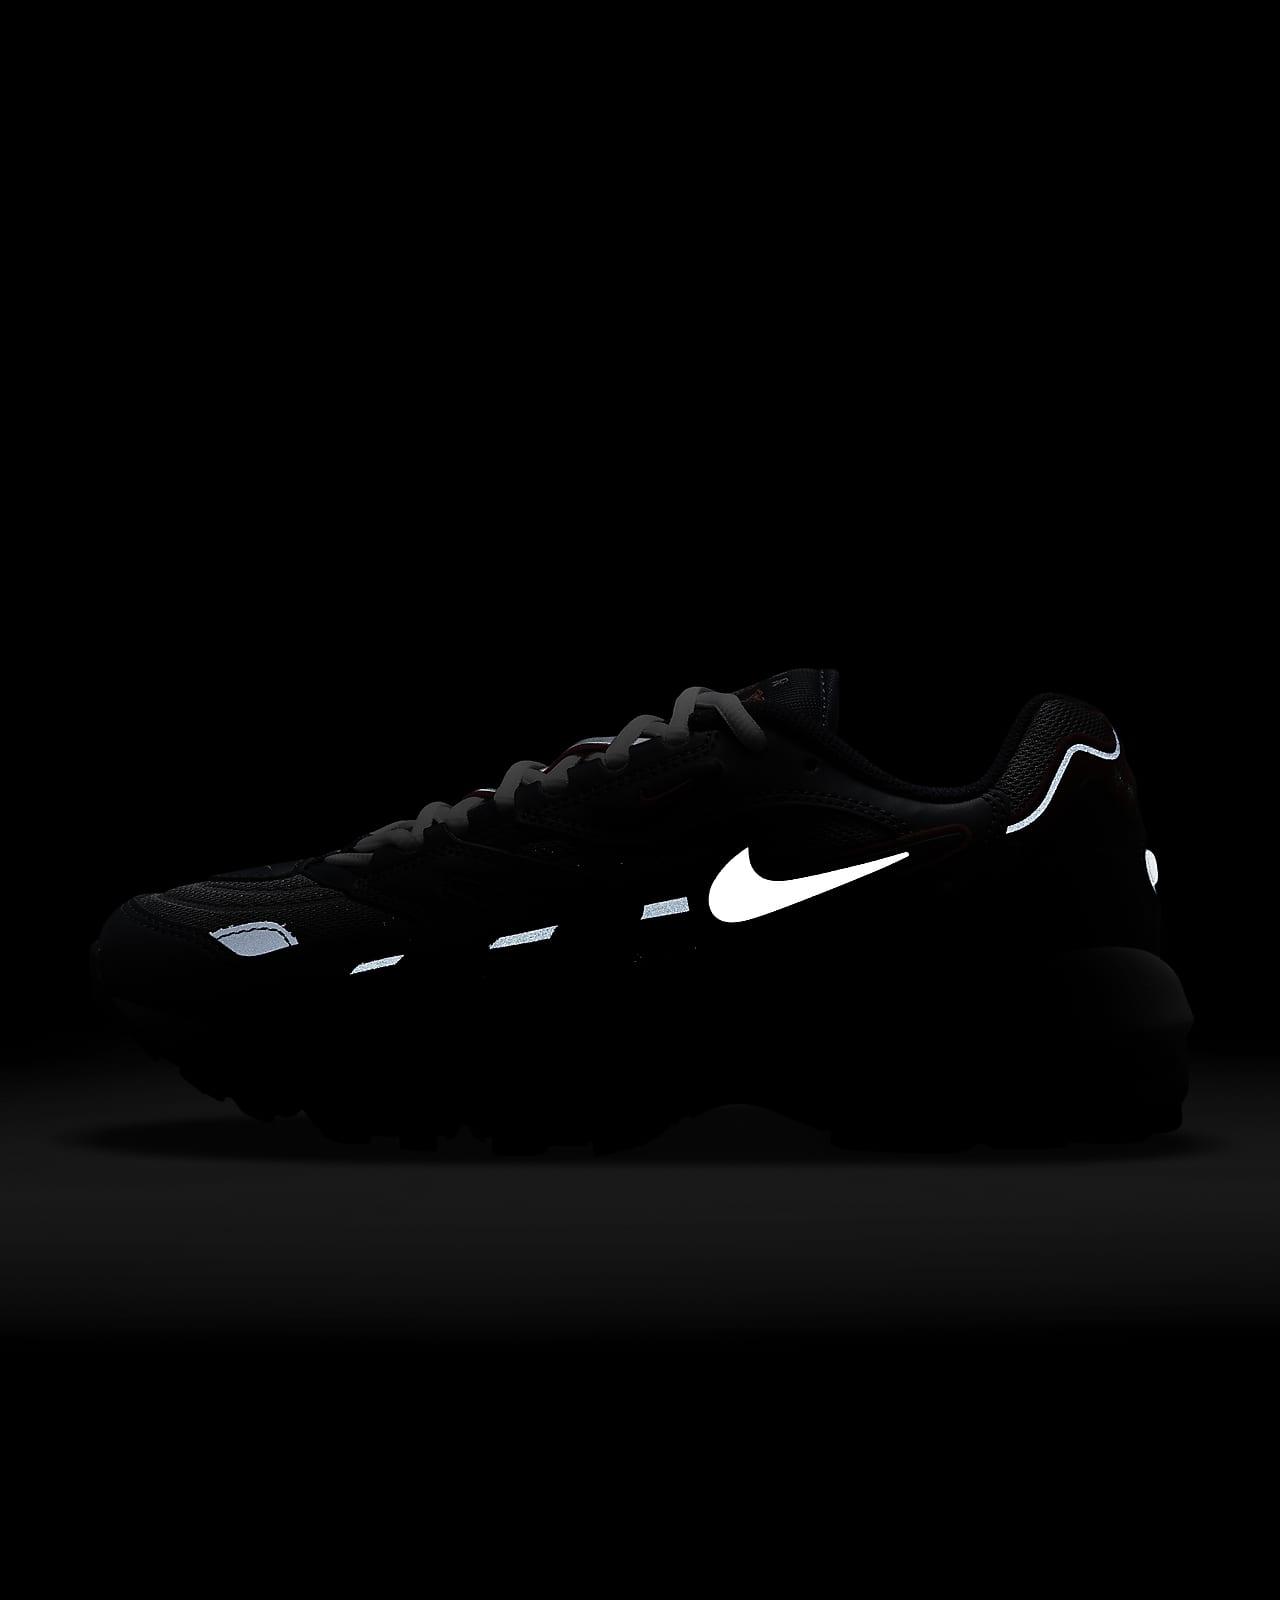 Scarpe Nike Air Max 96 2 - Uomo